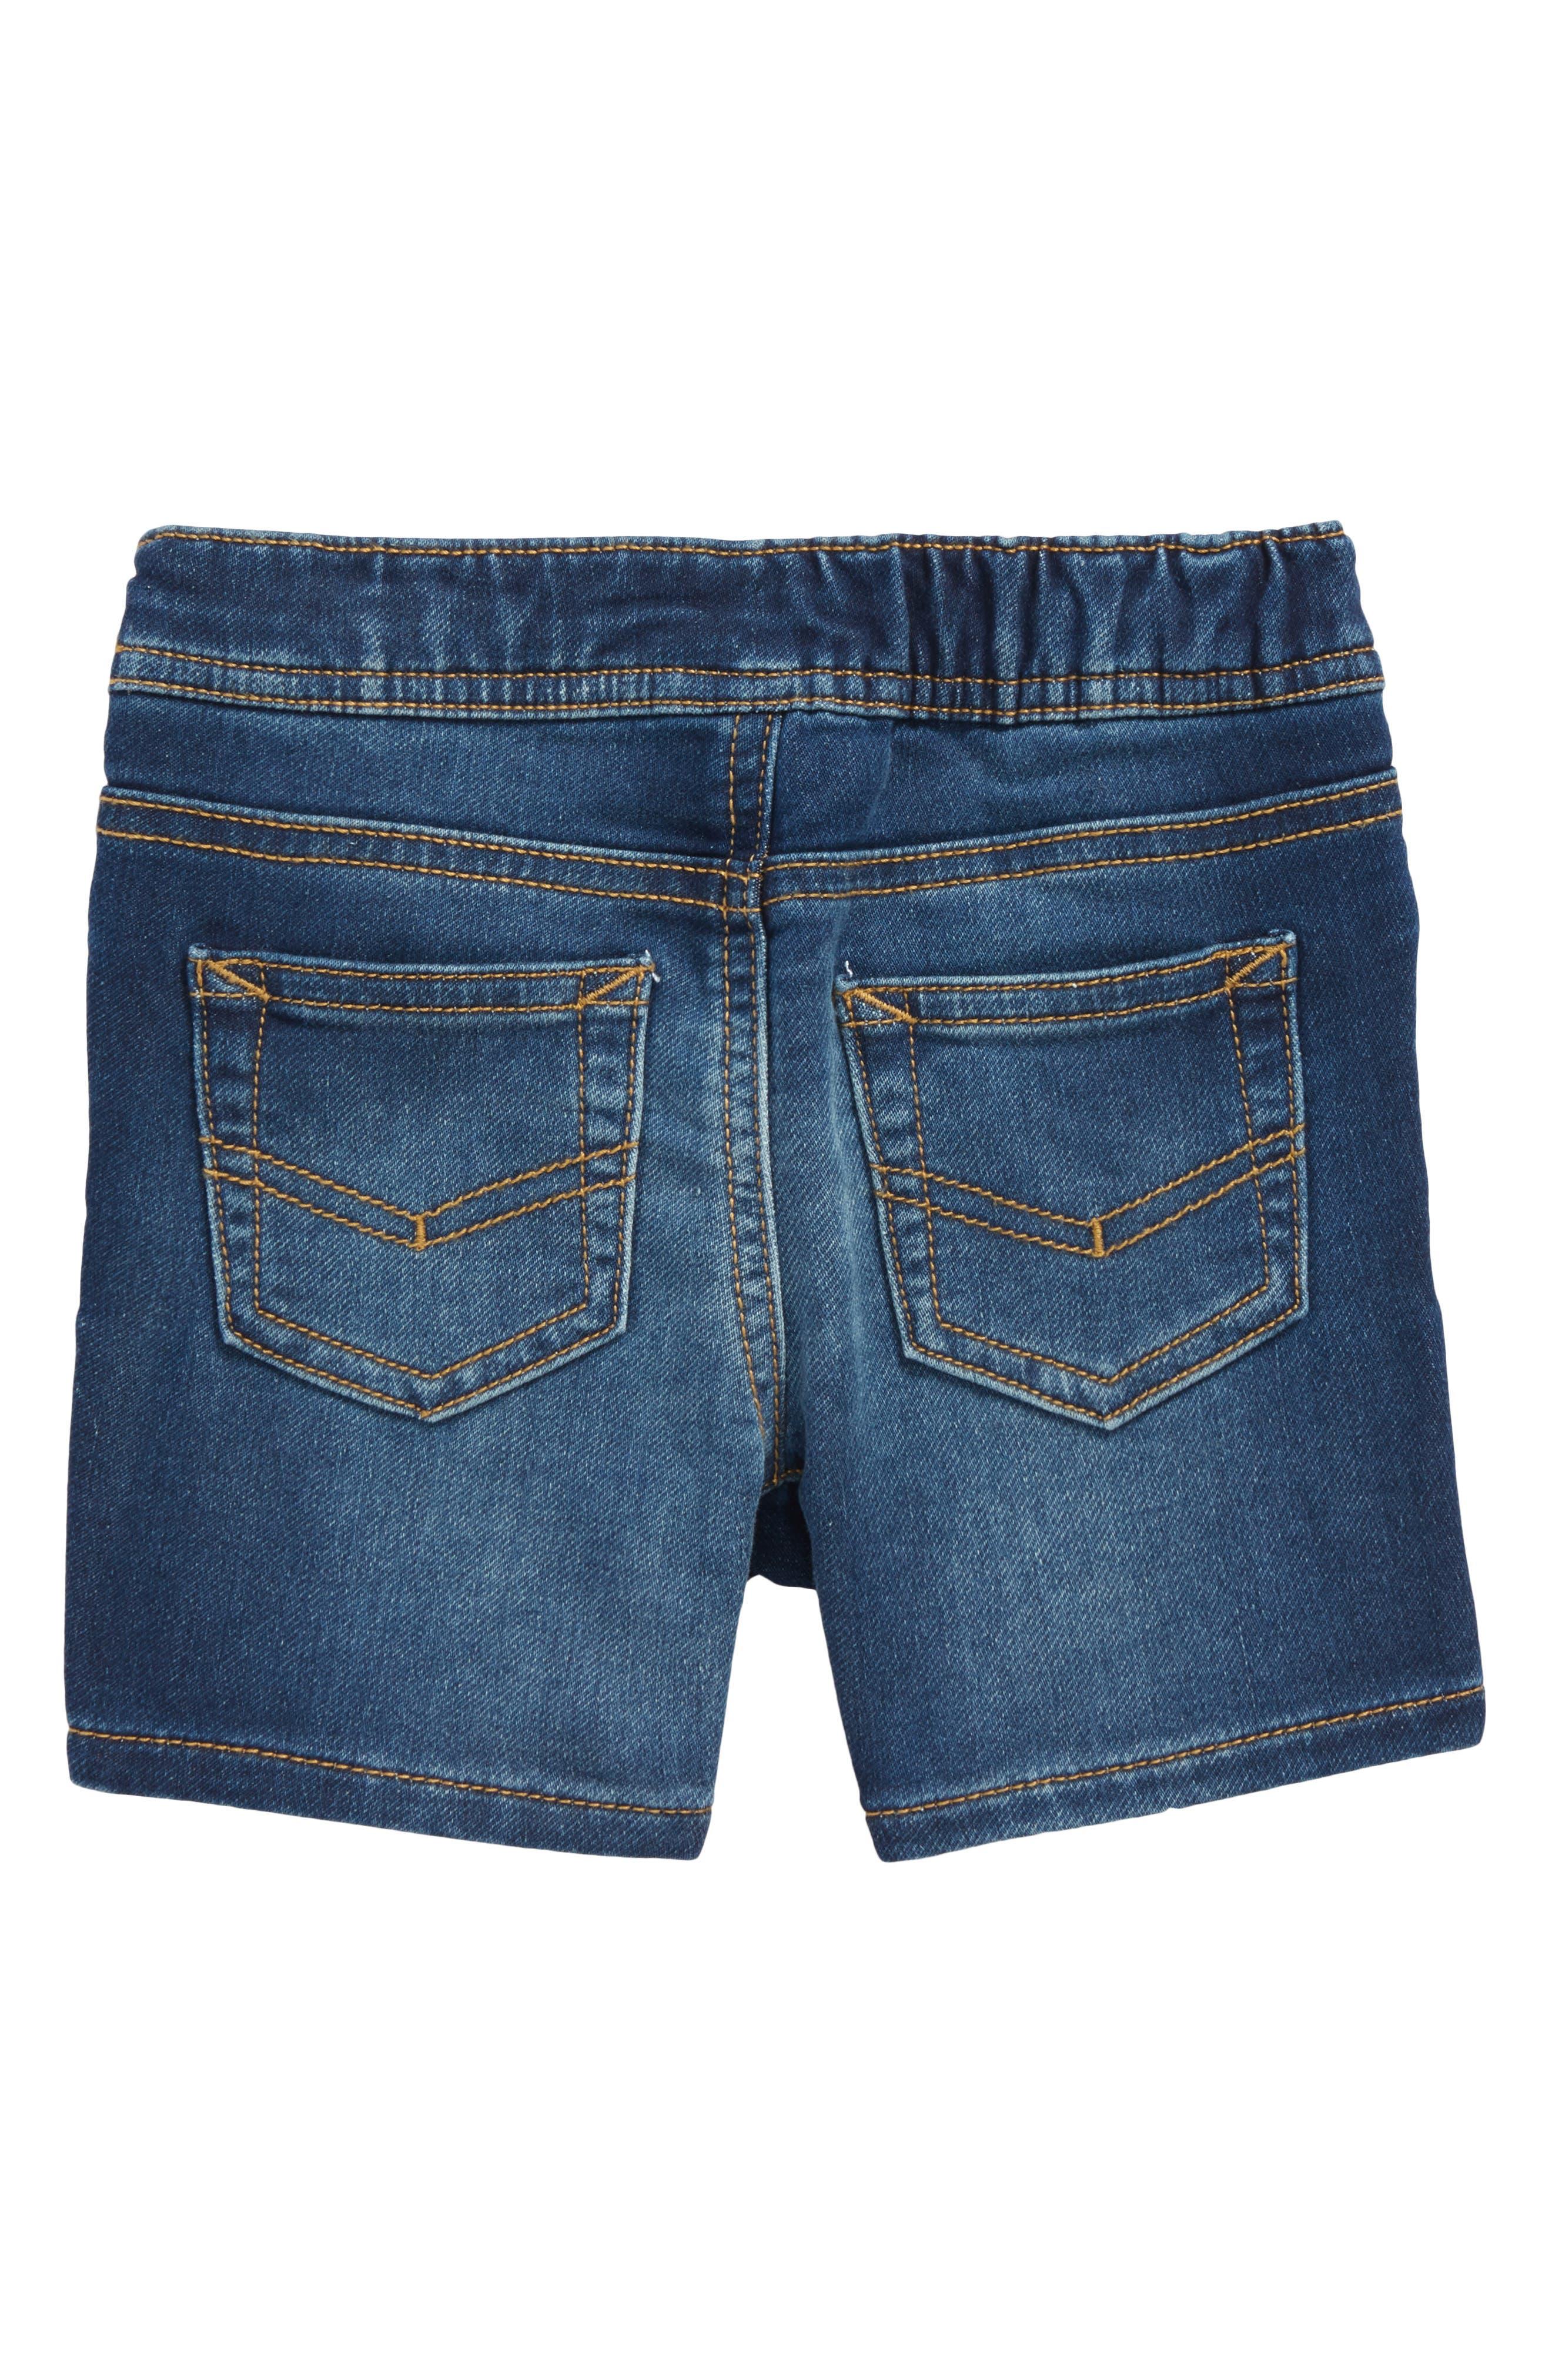 Denim Shorts,                             Alternate thumbnail 2, color,                             Bale Wash